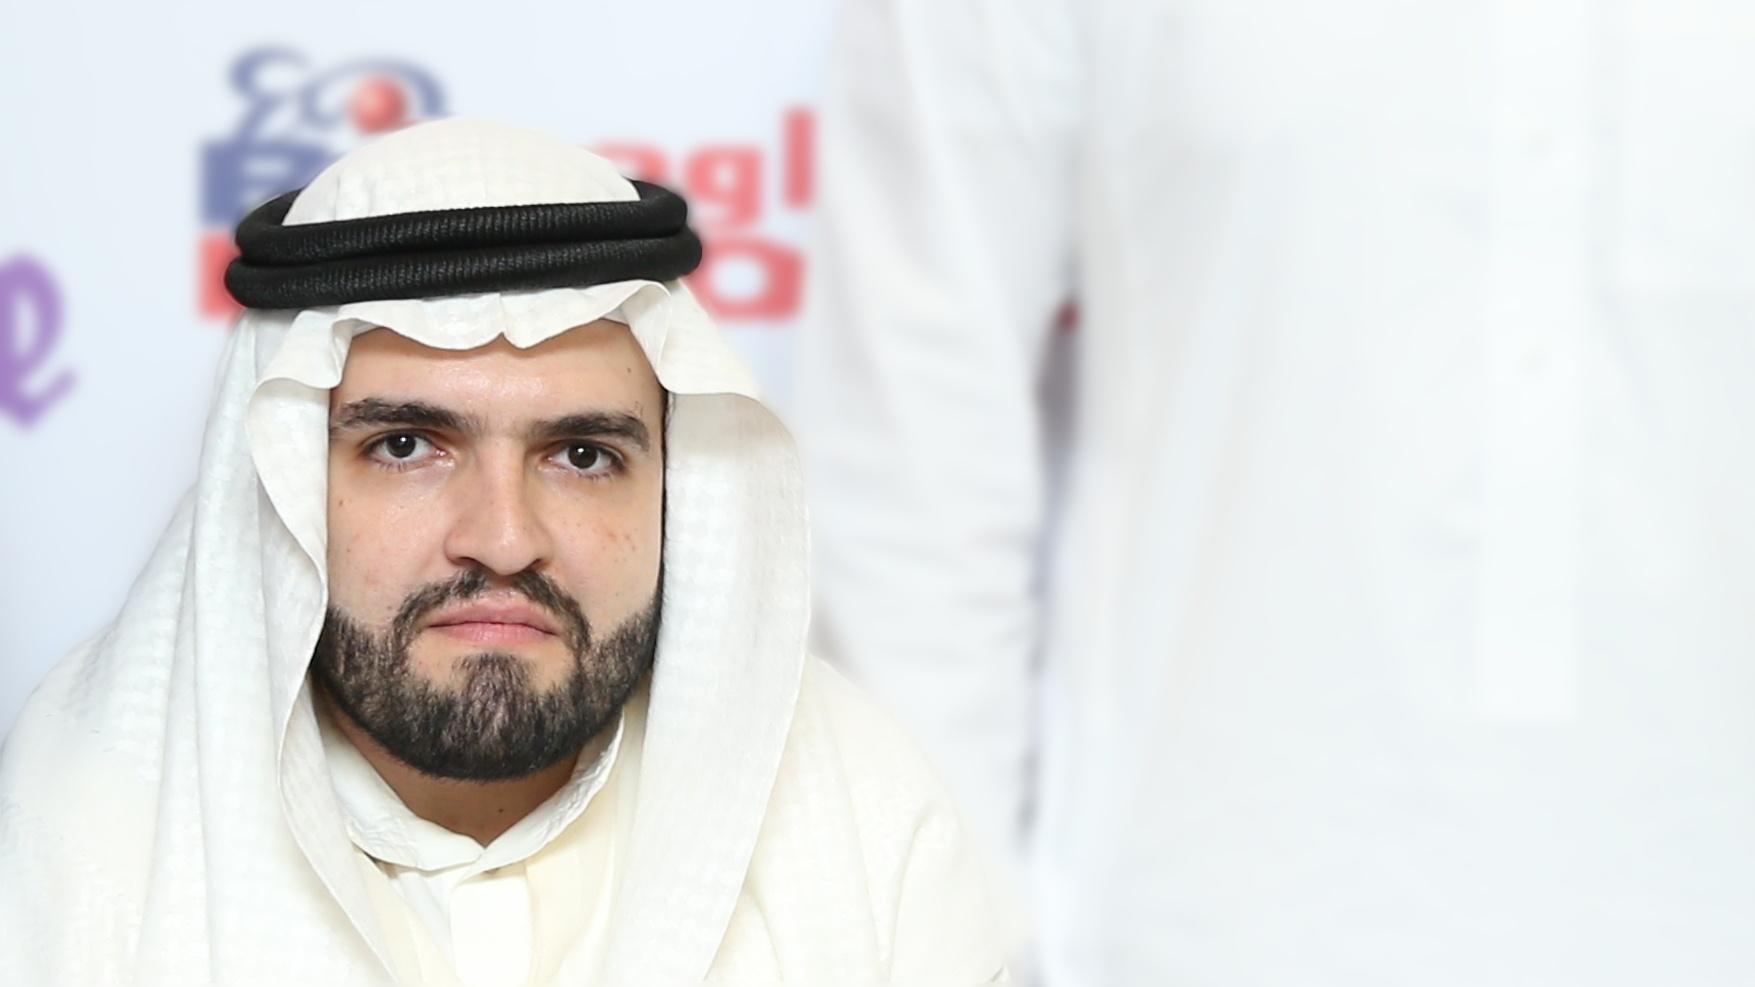 Majed Al Tahan